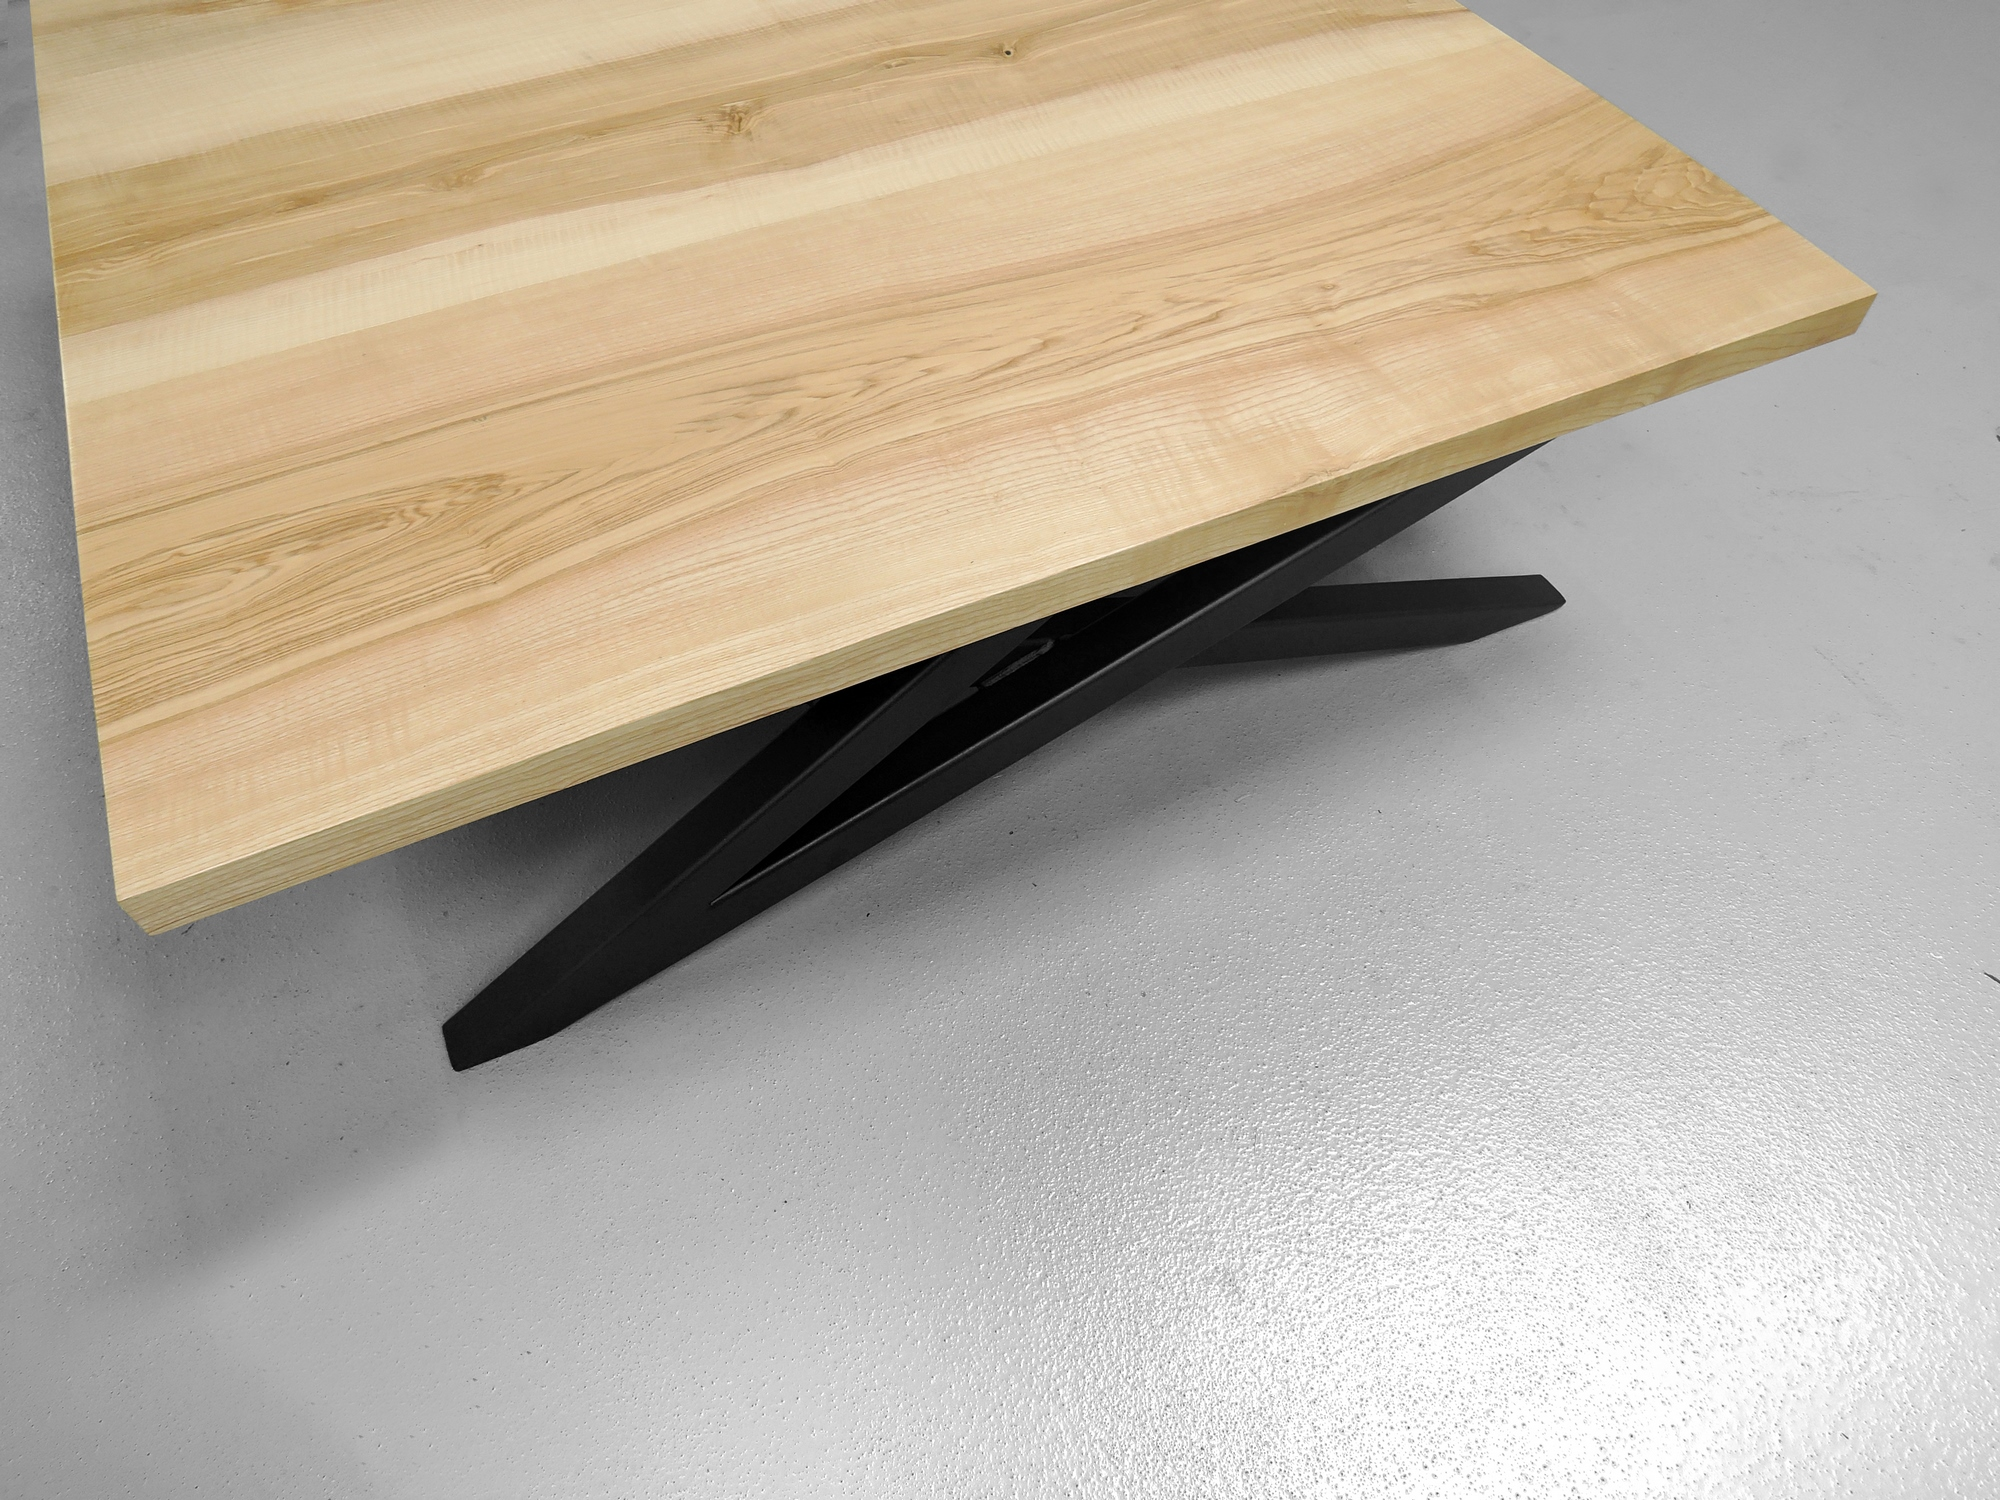 ARTMETA table basse signature sur mesure bois massif et acier